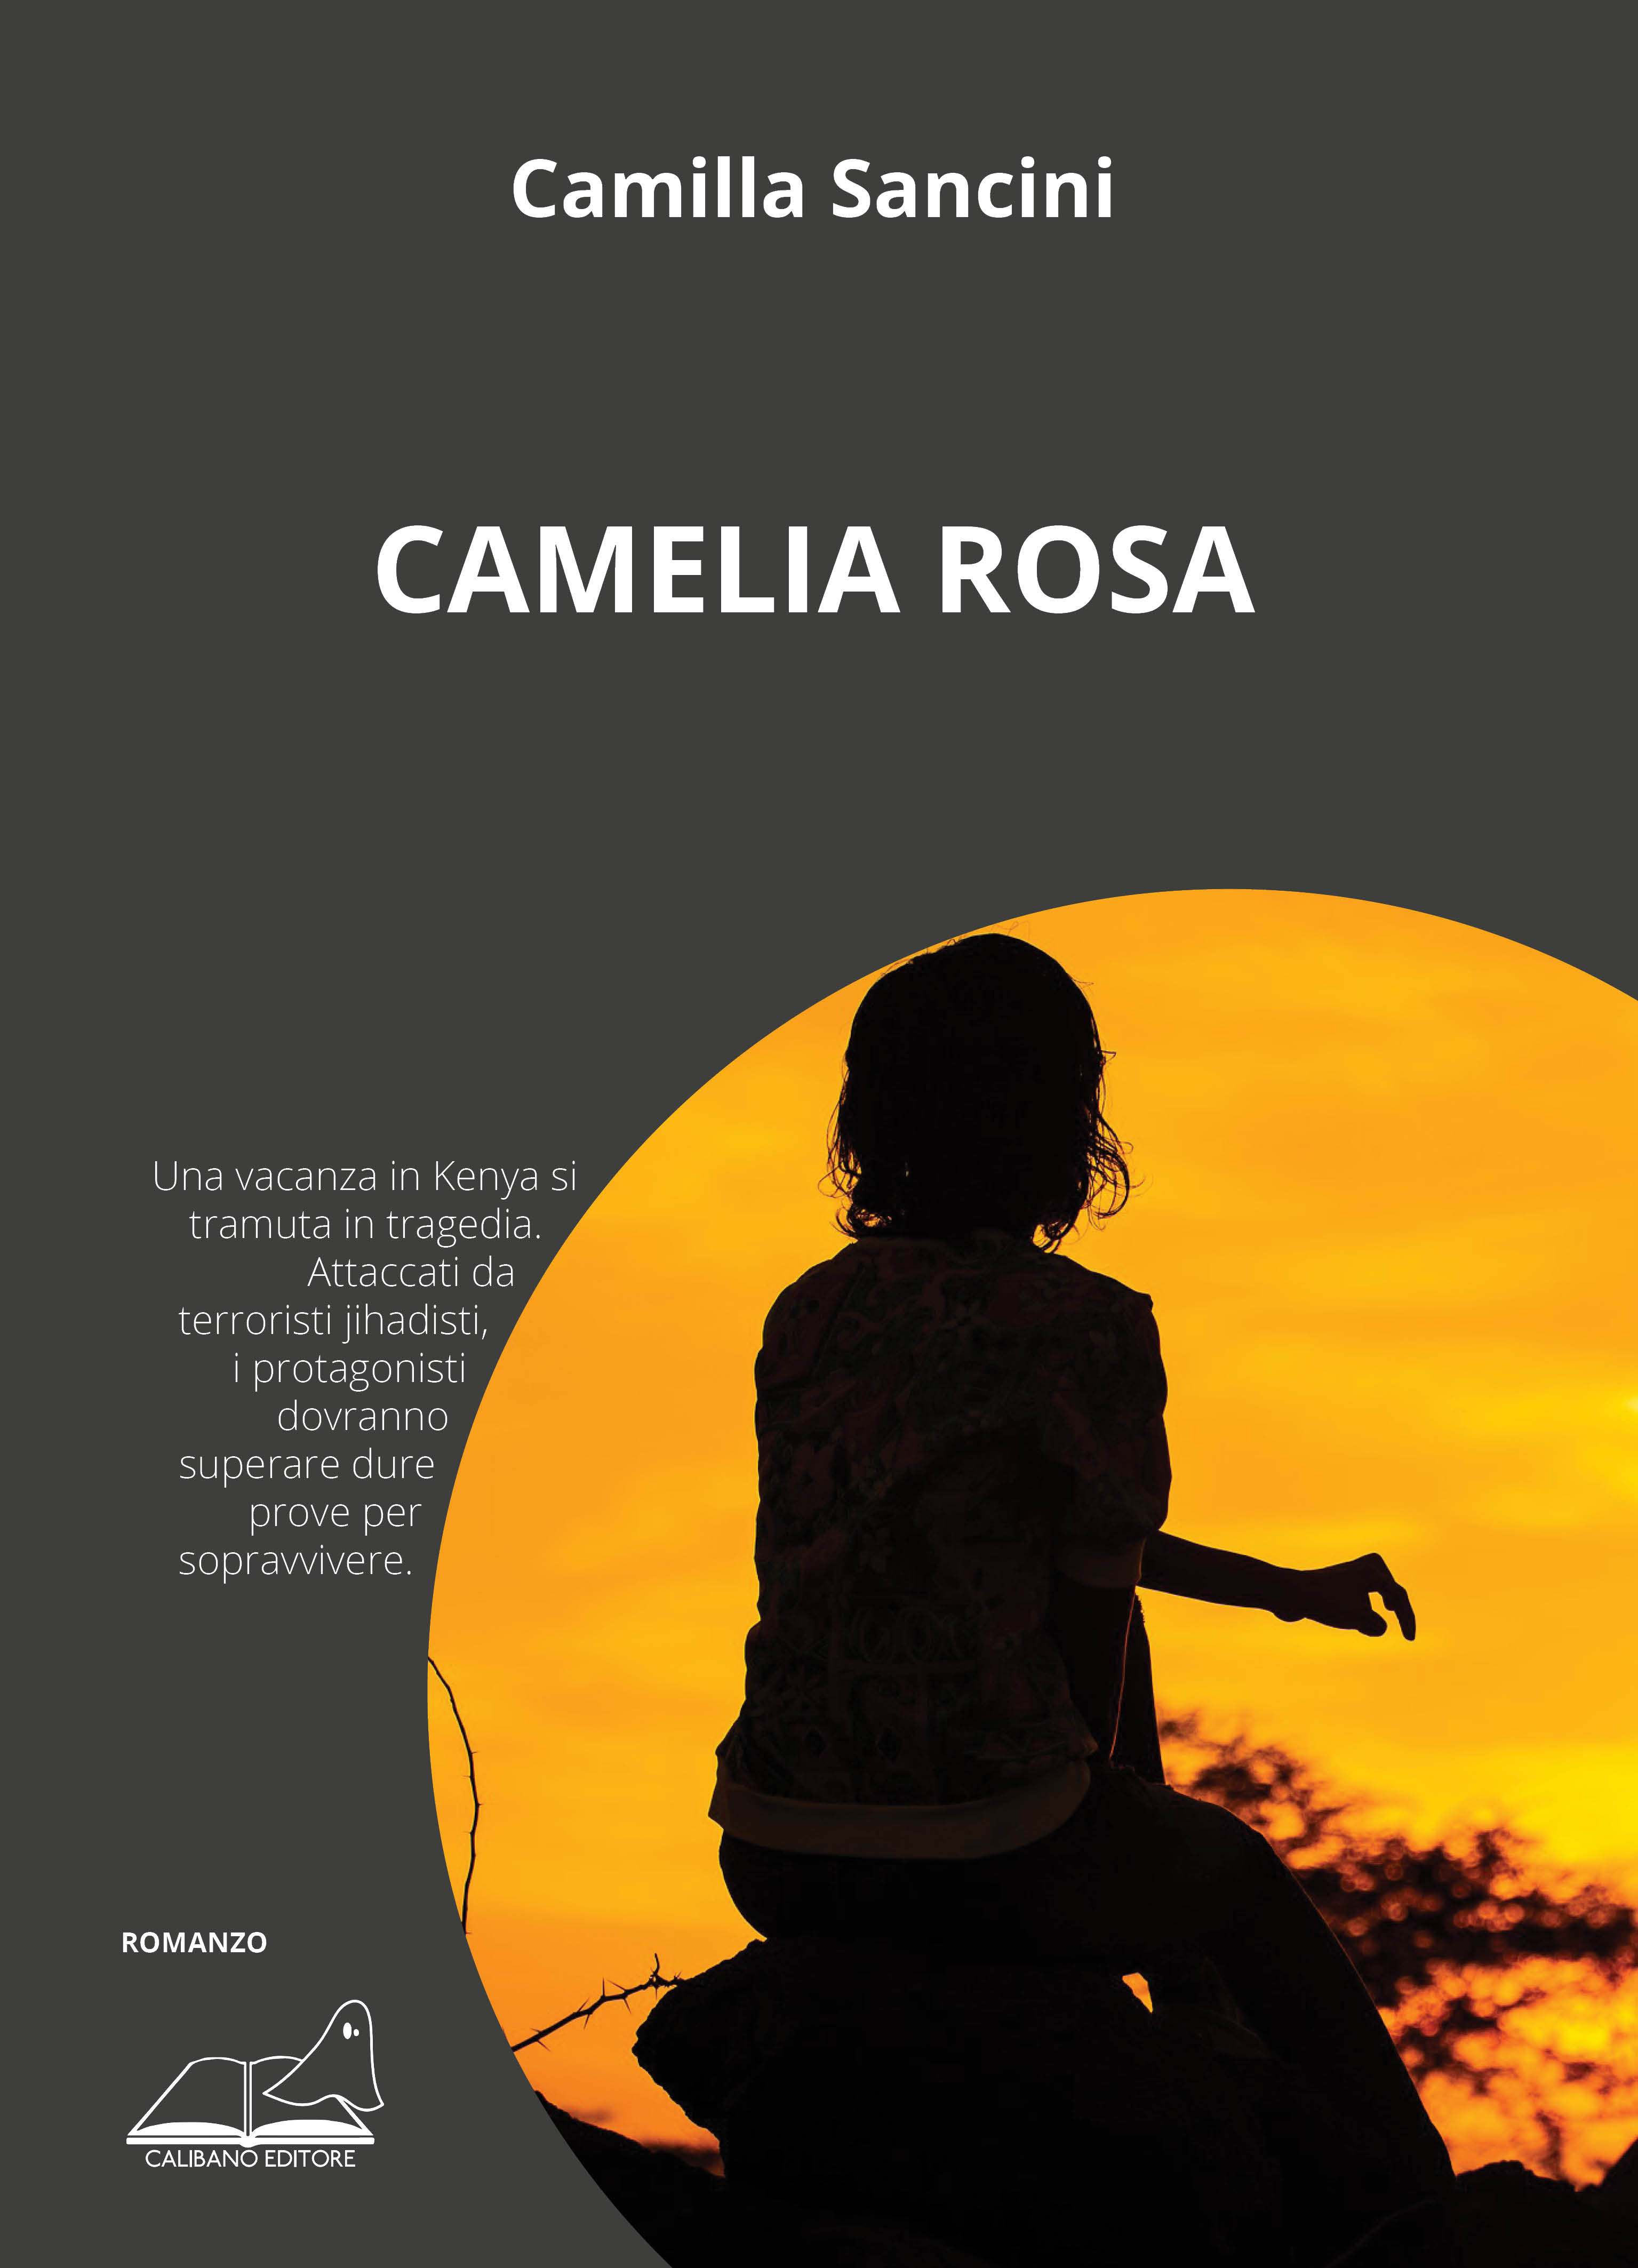 Camelia Rosa-image-1%>